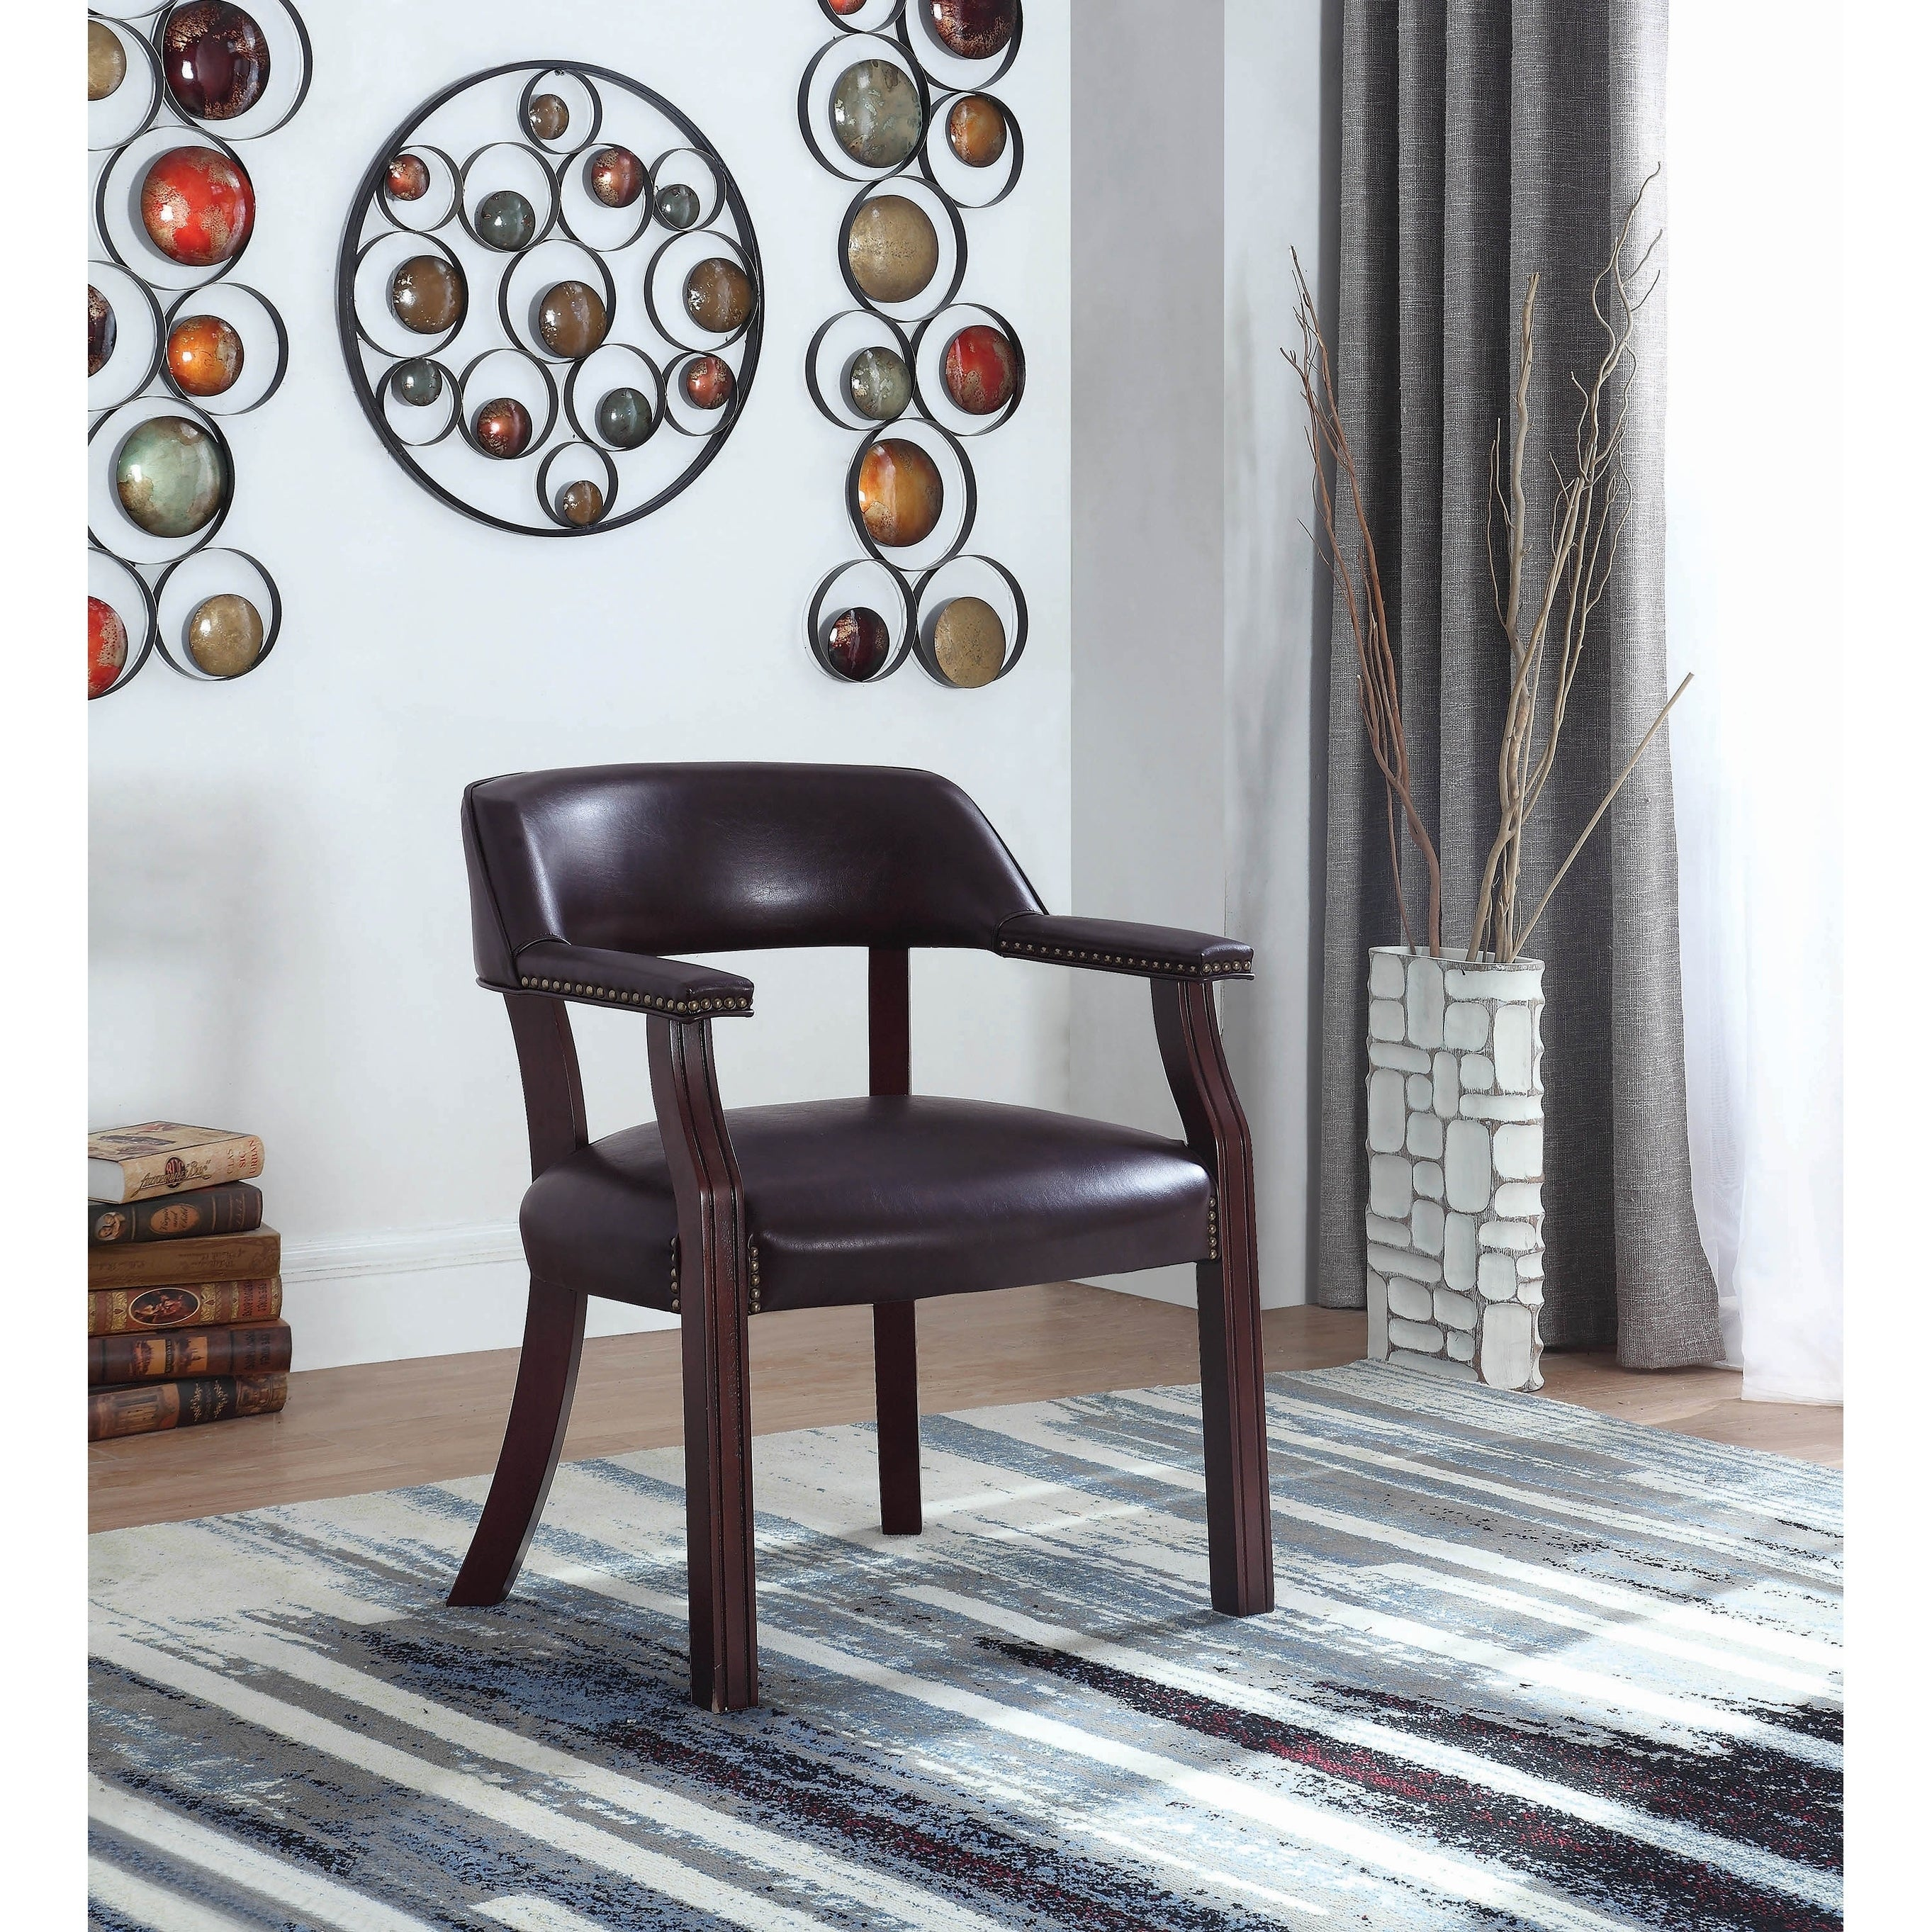 Shop Megumi Brown And Dark Cherry Office Chair Overstock 28630688